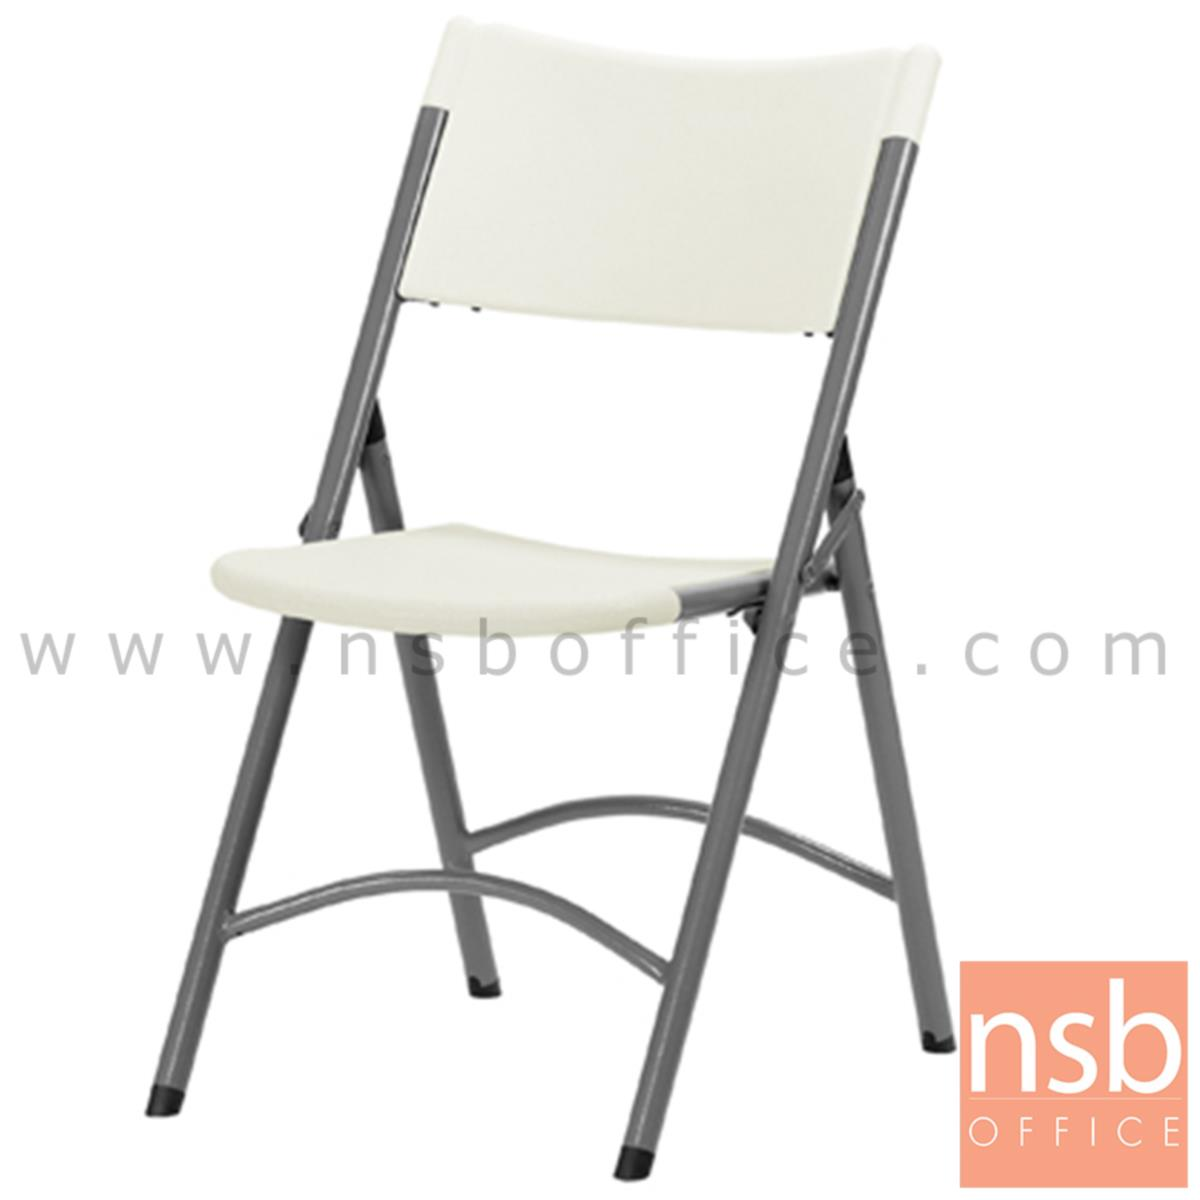 A19A014:เก้าอี้พับที่นั่งพลาสติก รุ่น Trenton (เทรนตัน) ขาเหล็กอีพ็อกซี่เกล็กเงิน